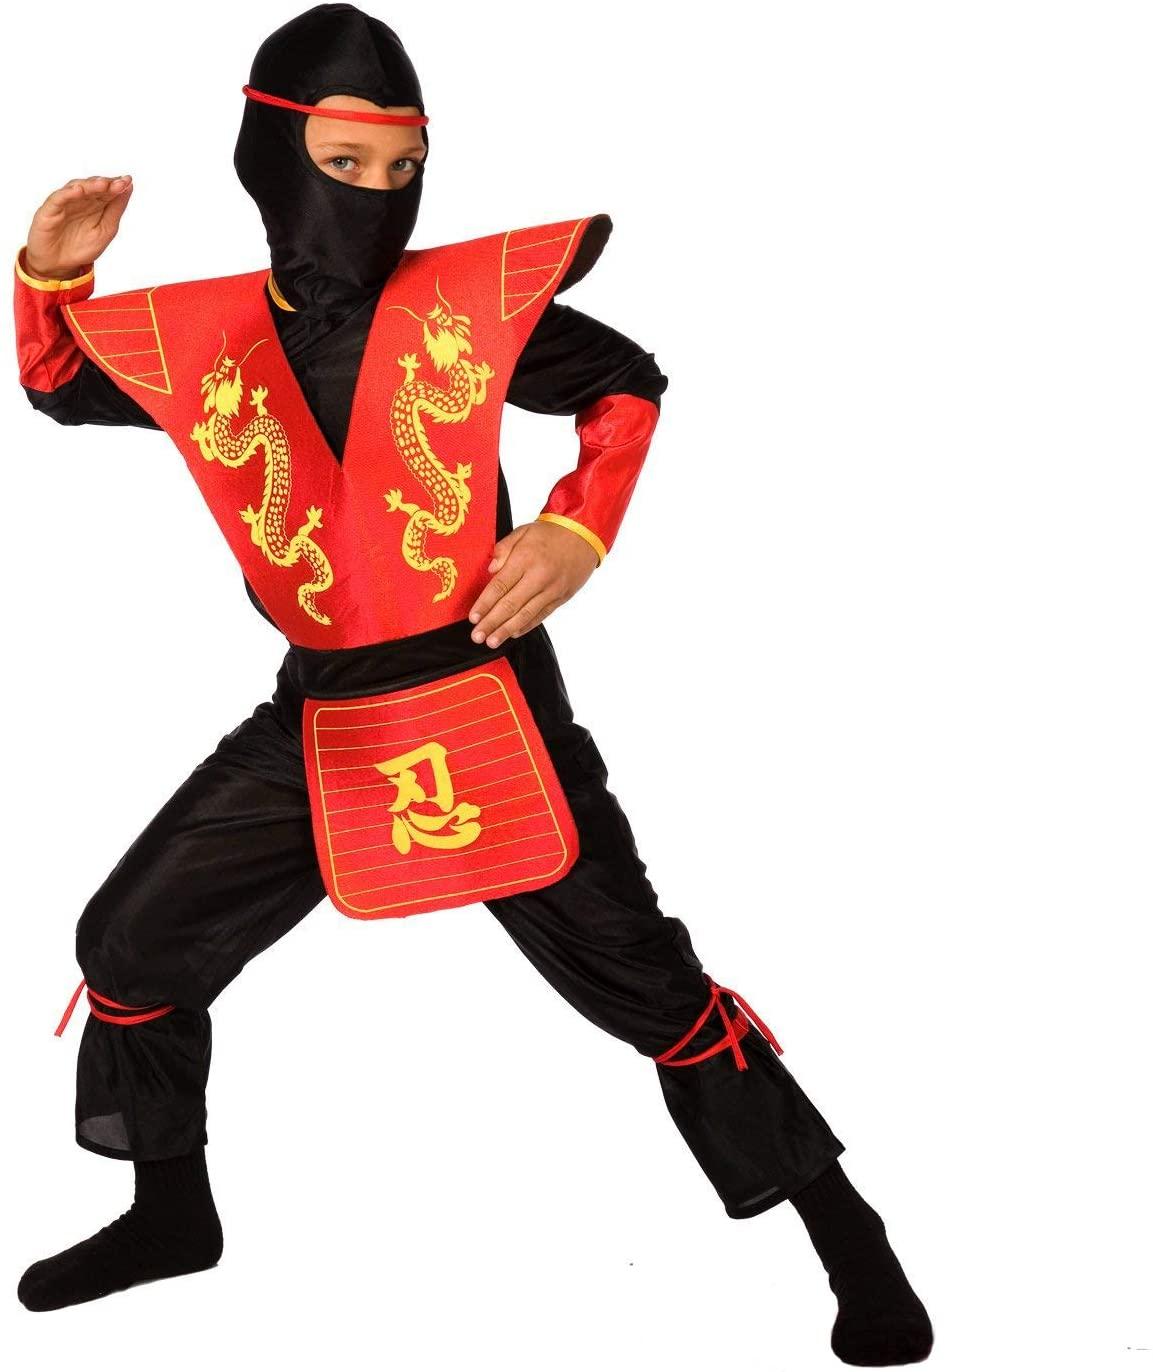 Kids Ninja Costume Childrens Red Kung Fu Dress Up Outfit - Medium (Age 6-8)